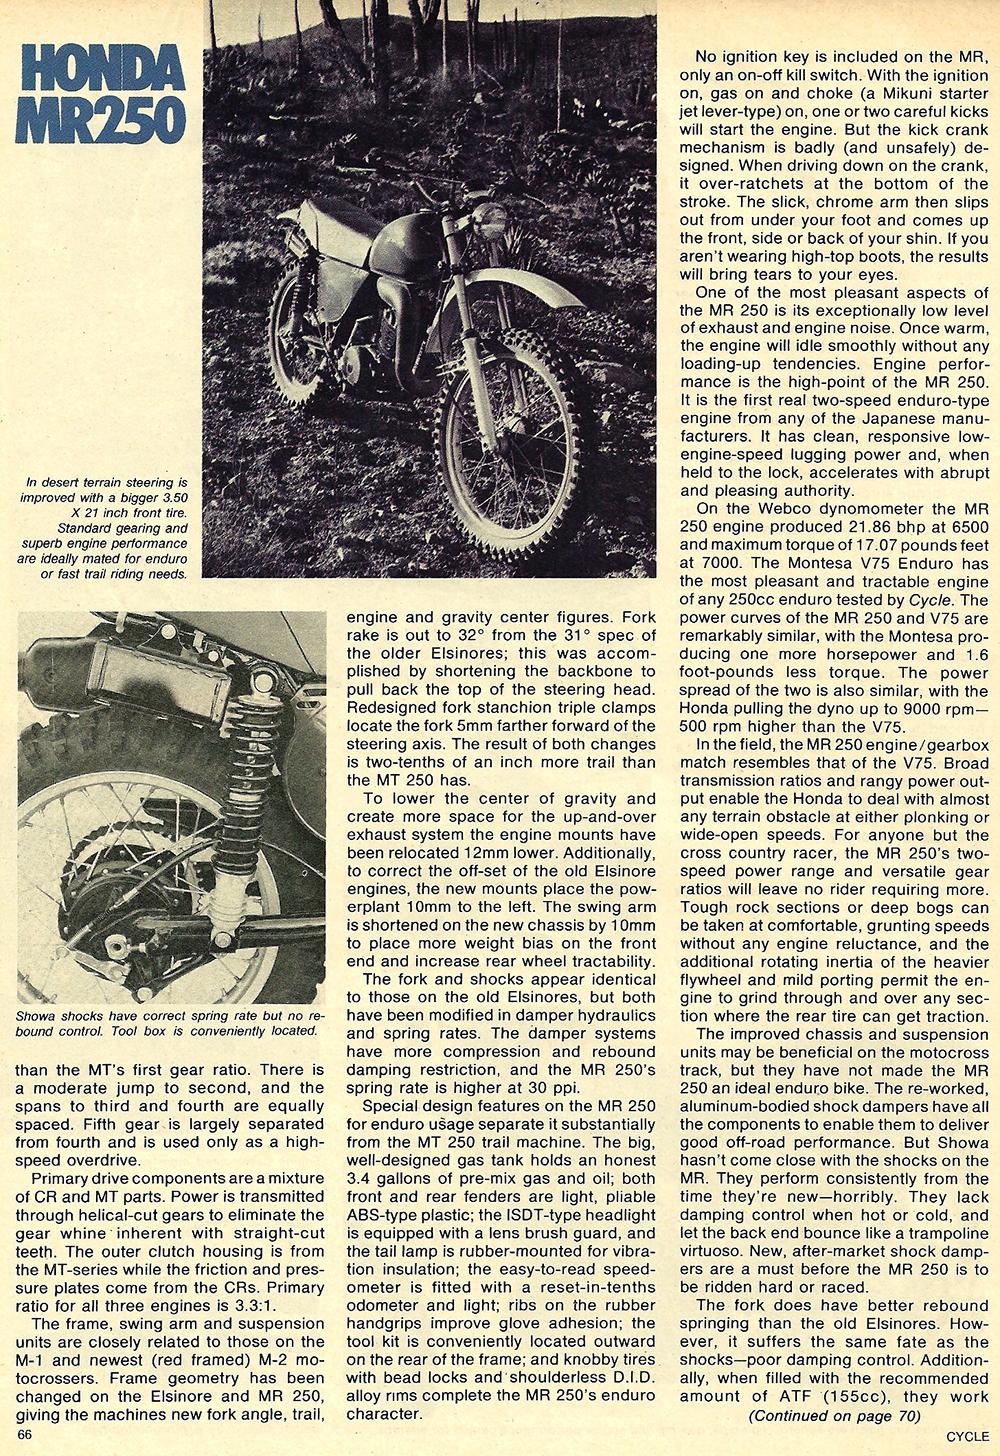 1976 Honda MR250 enduro road test 5.jpg